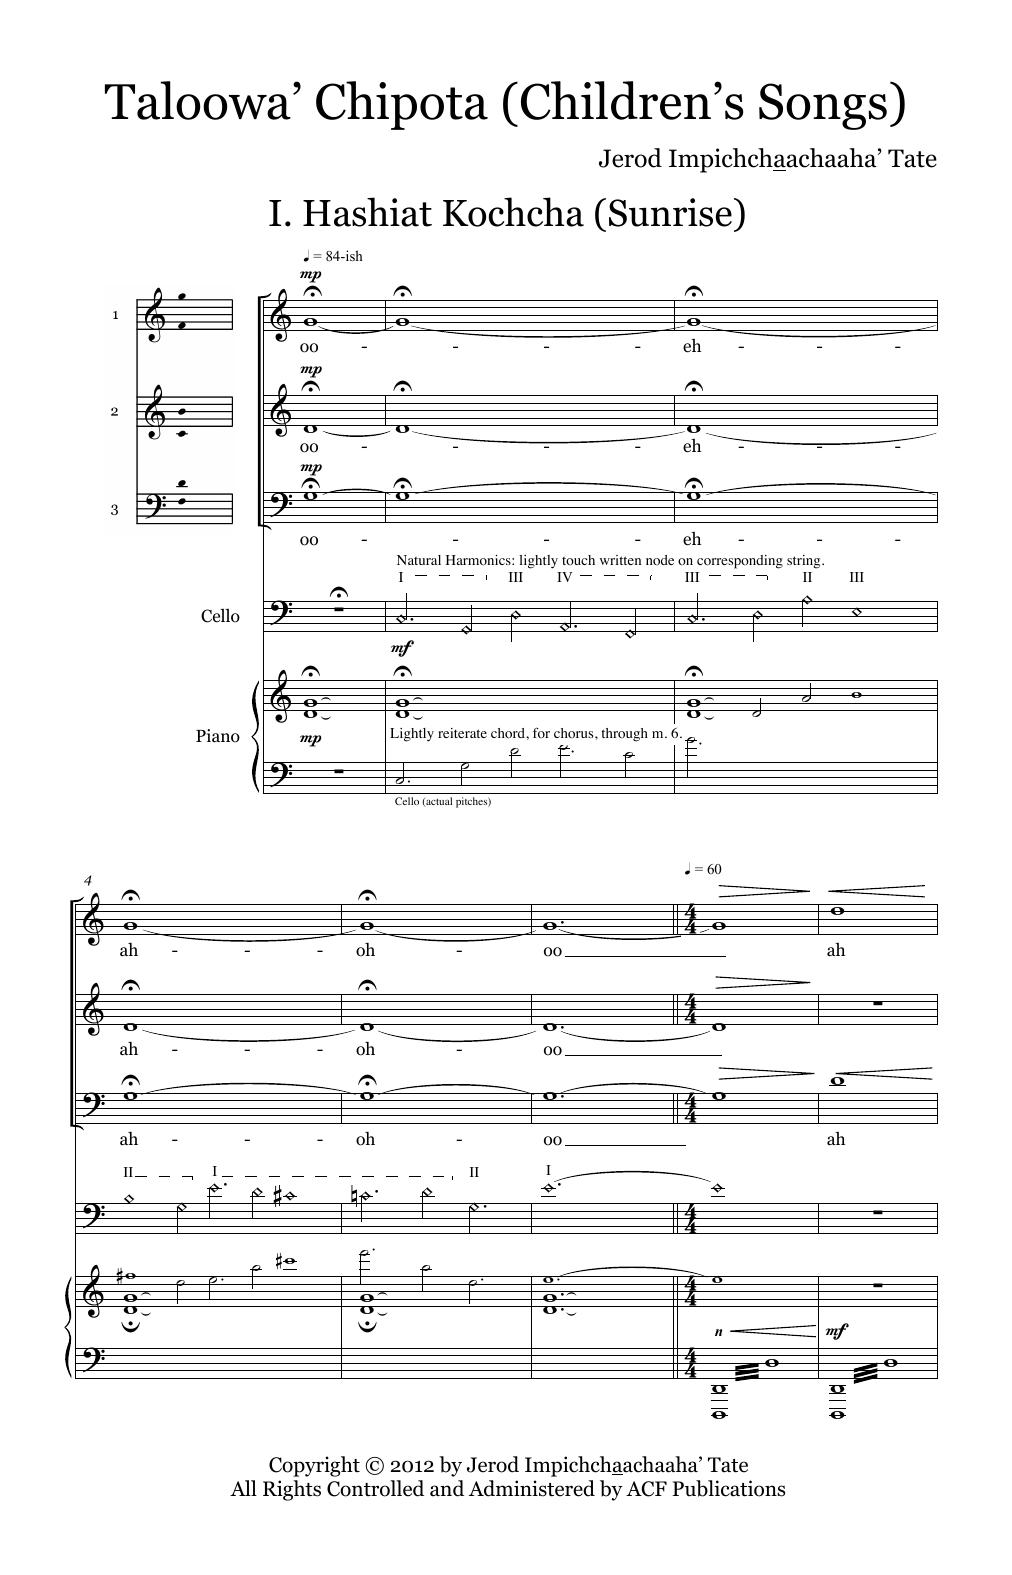 ChoralQuest - Taloowa' Chipota (Children's Songs)